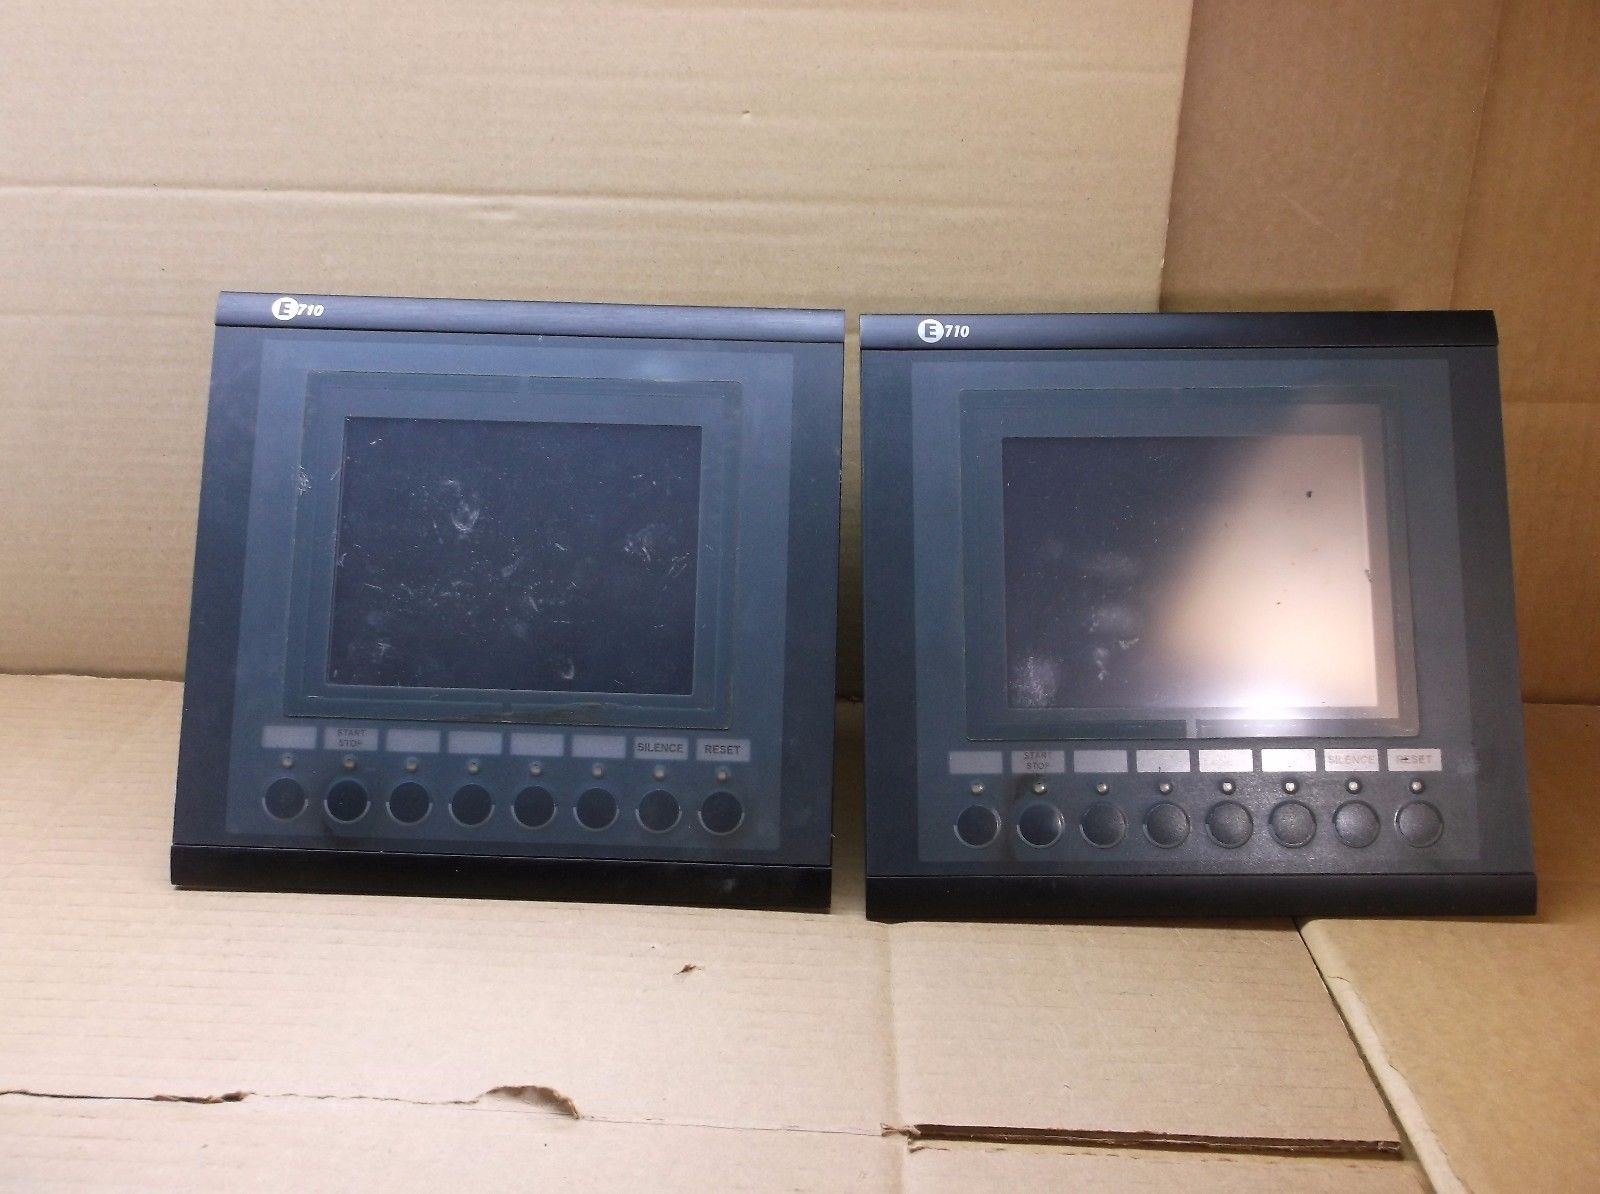 LCD Màn Hình E710 HMI Beijer